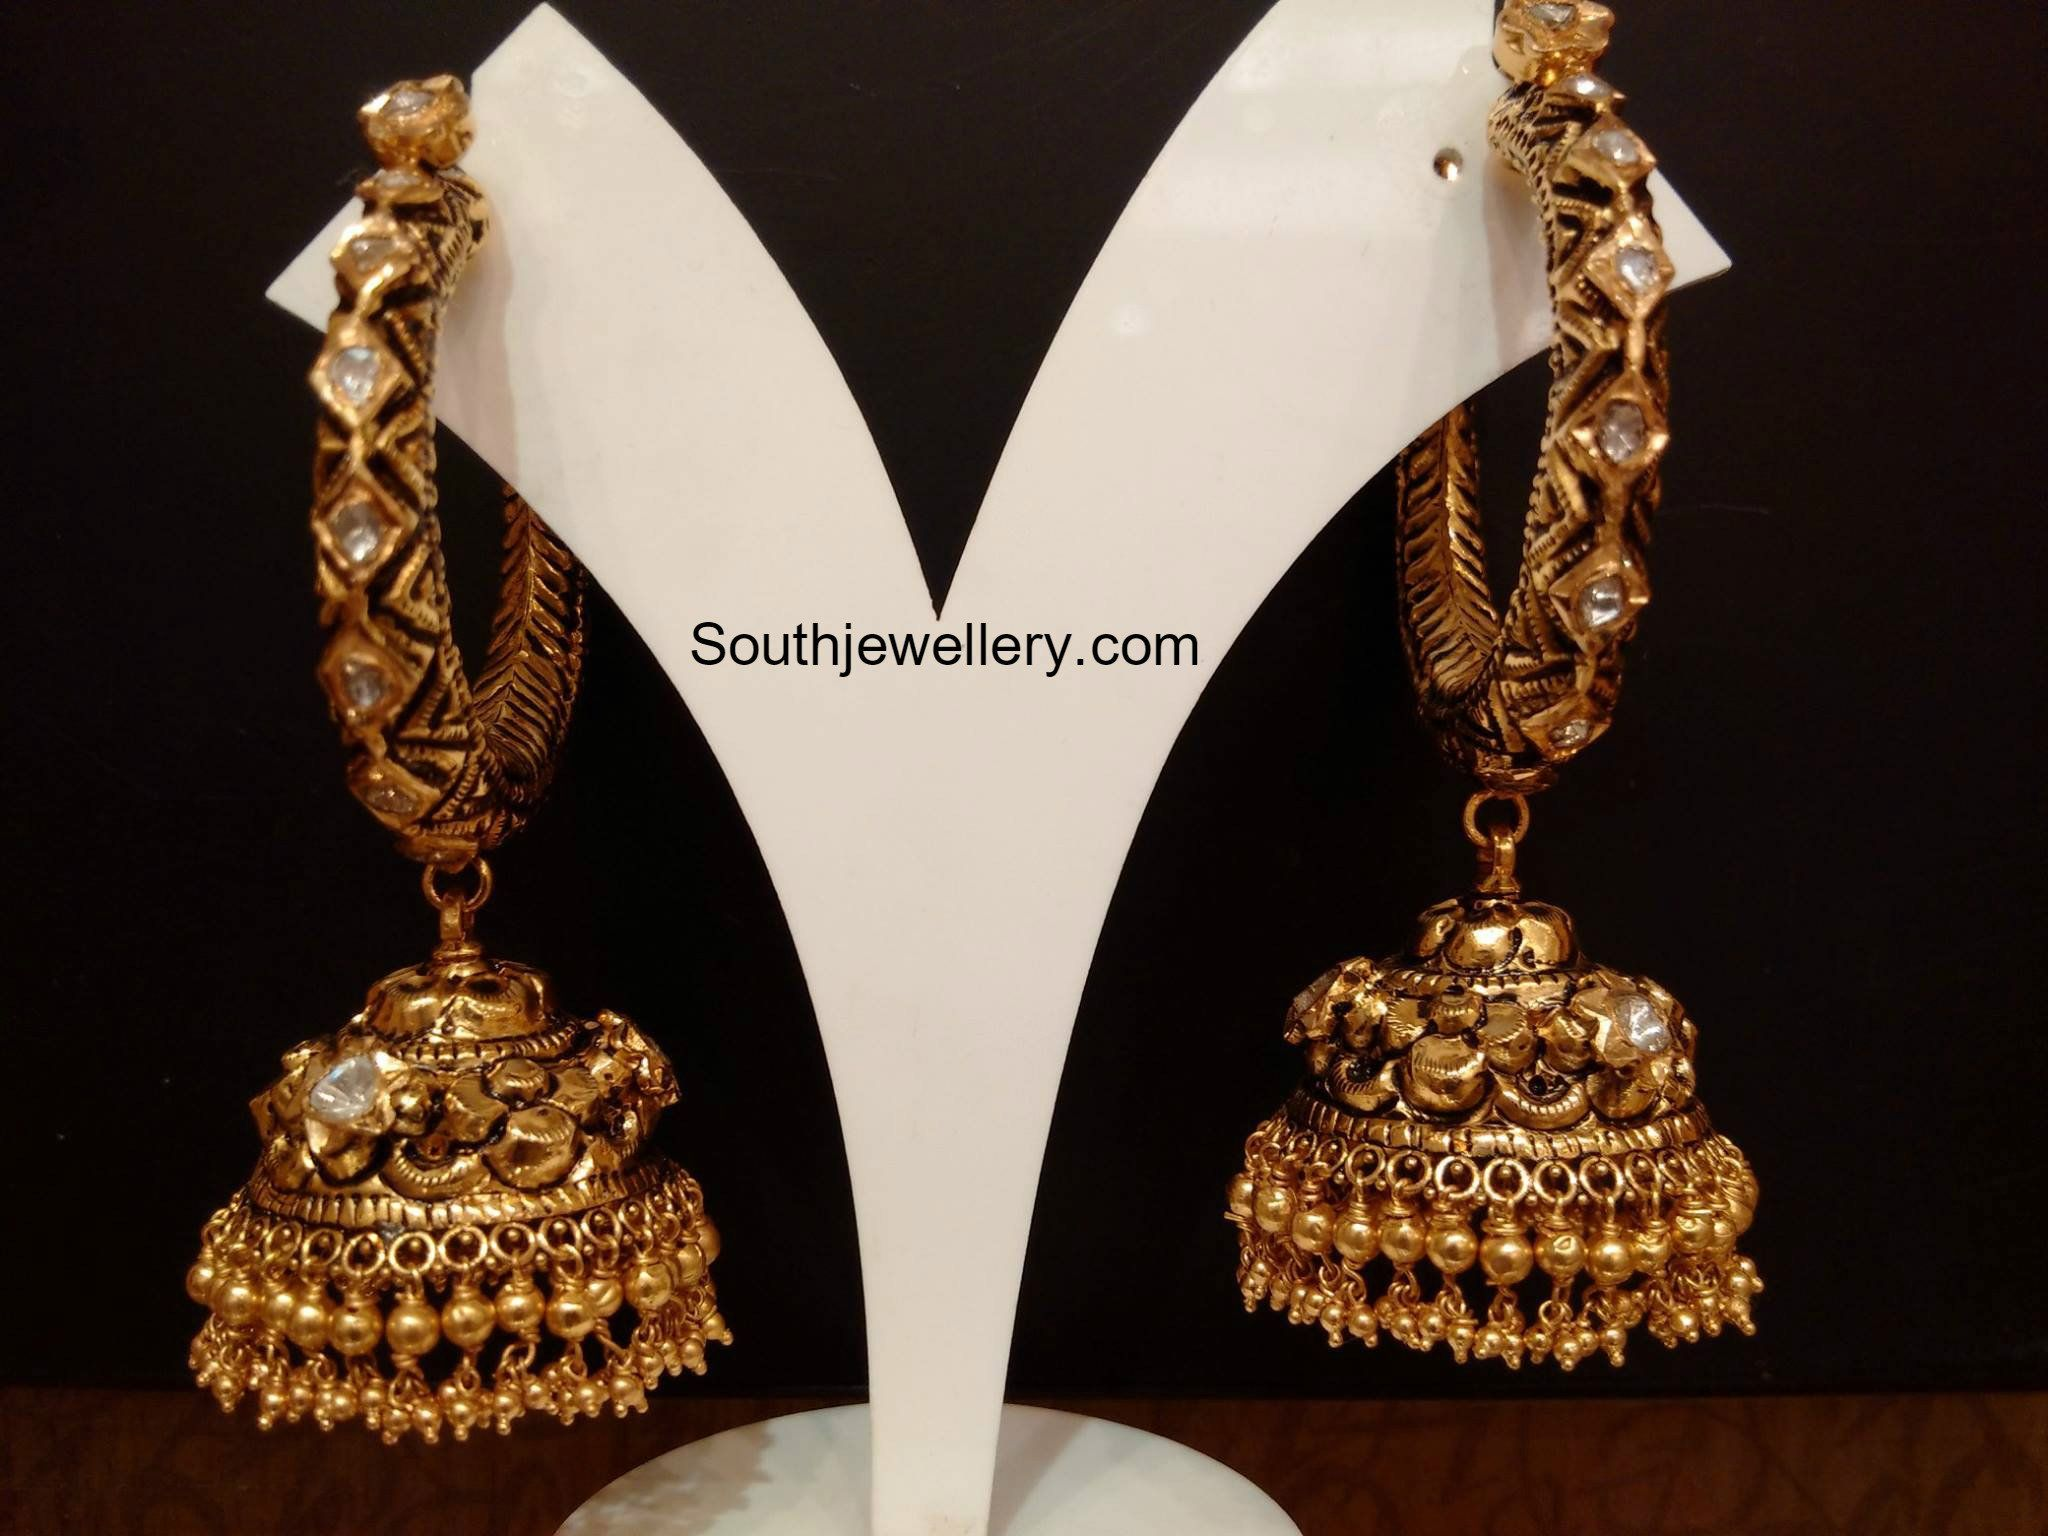 Antique Gold Jhumkas, 22 carat gold jewellery, jhumki designs ...